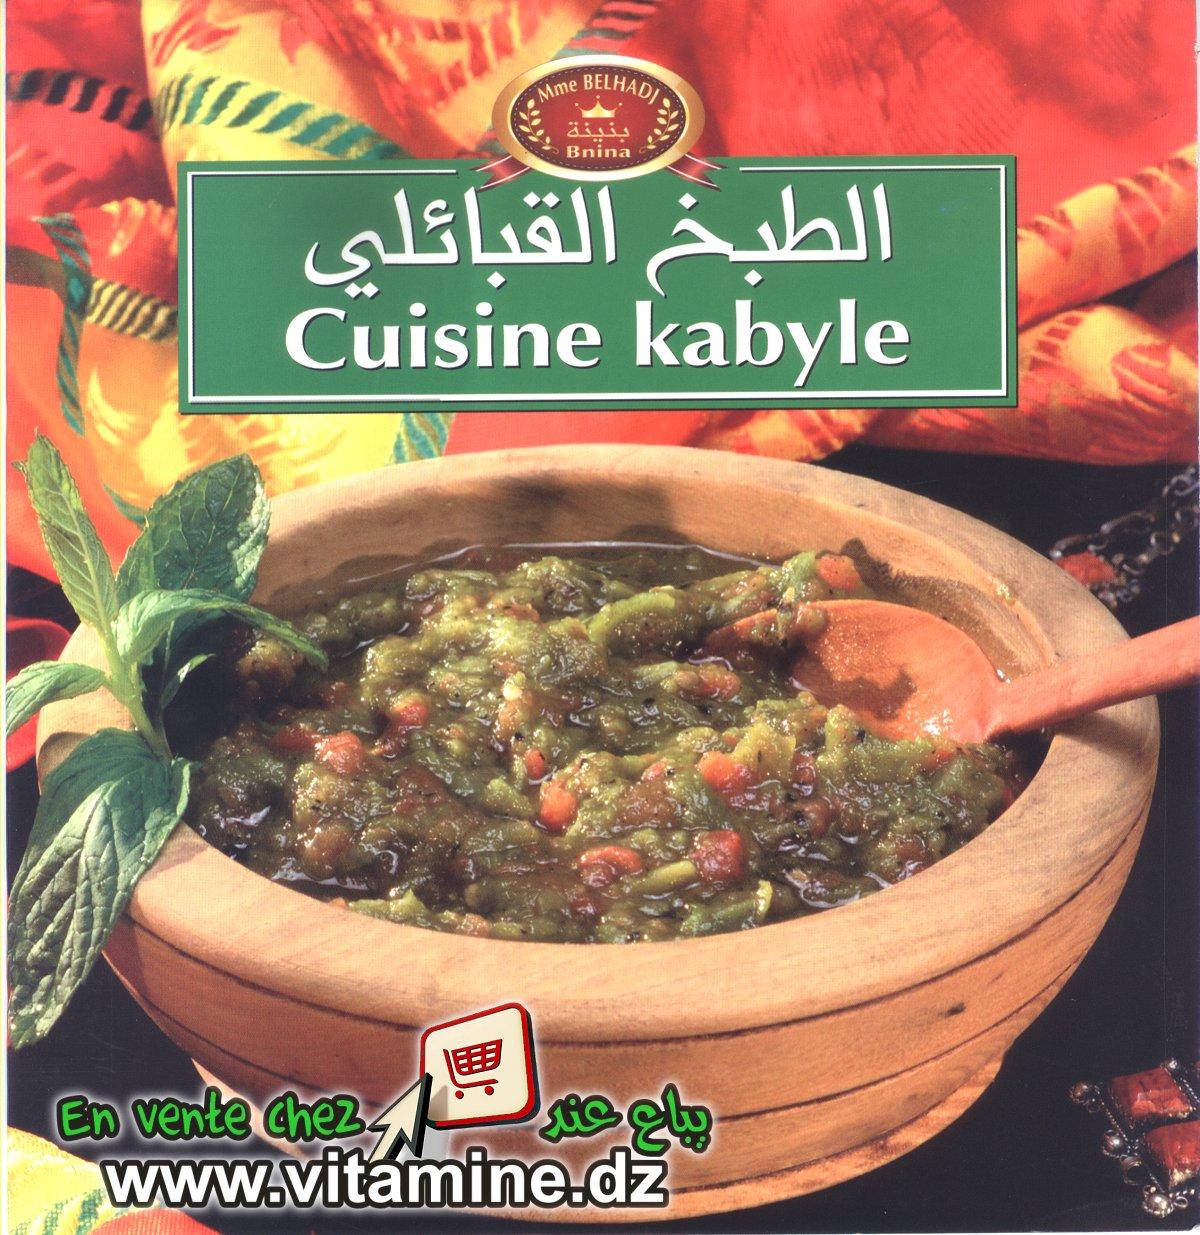 Bnina cuisine kabyle livres cuisine for Cuisine kabyle